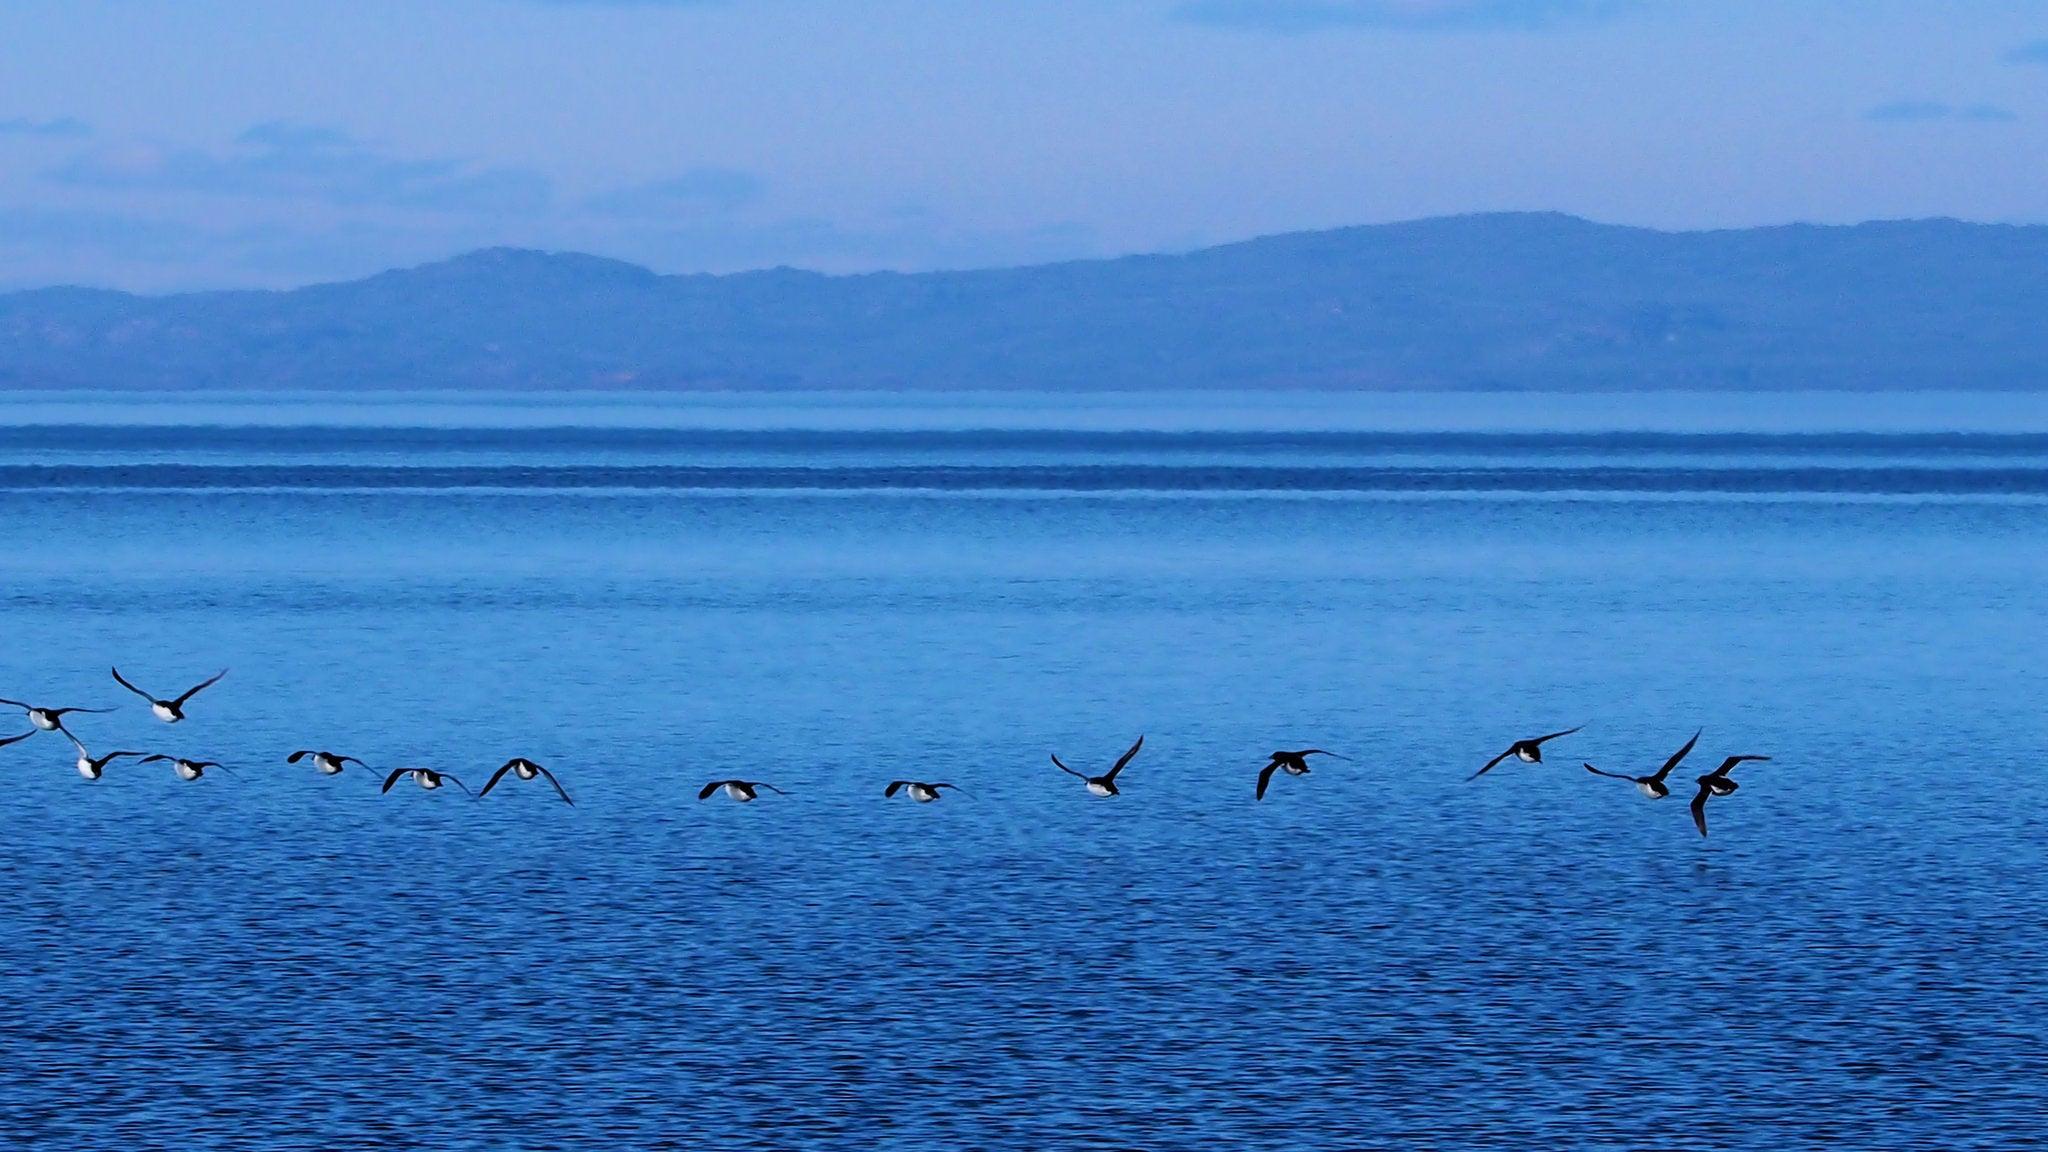 Bird poop might help keep the Arctic cool